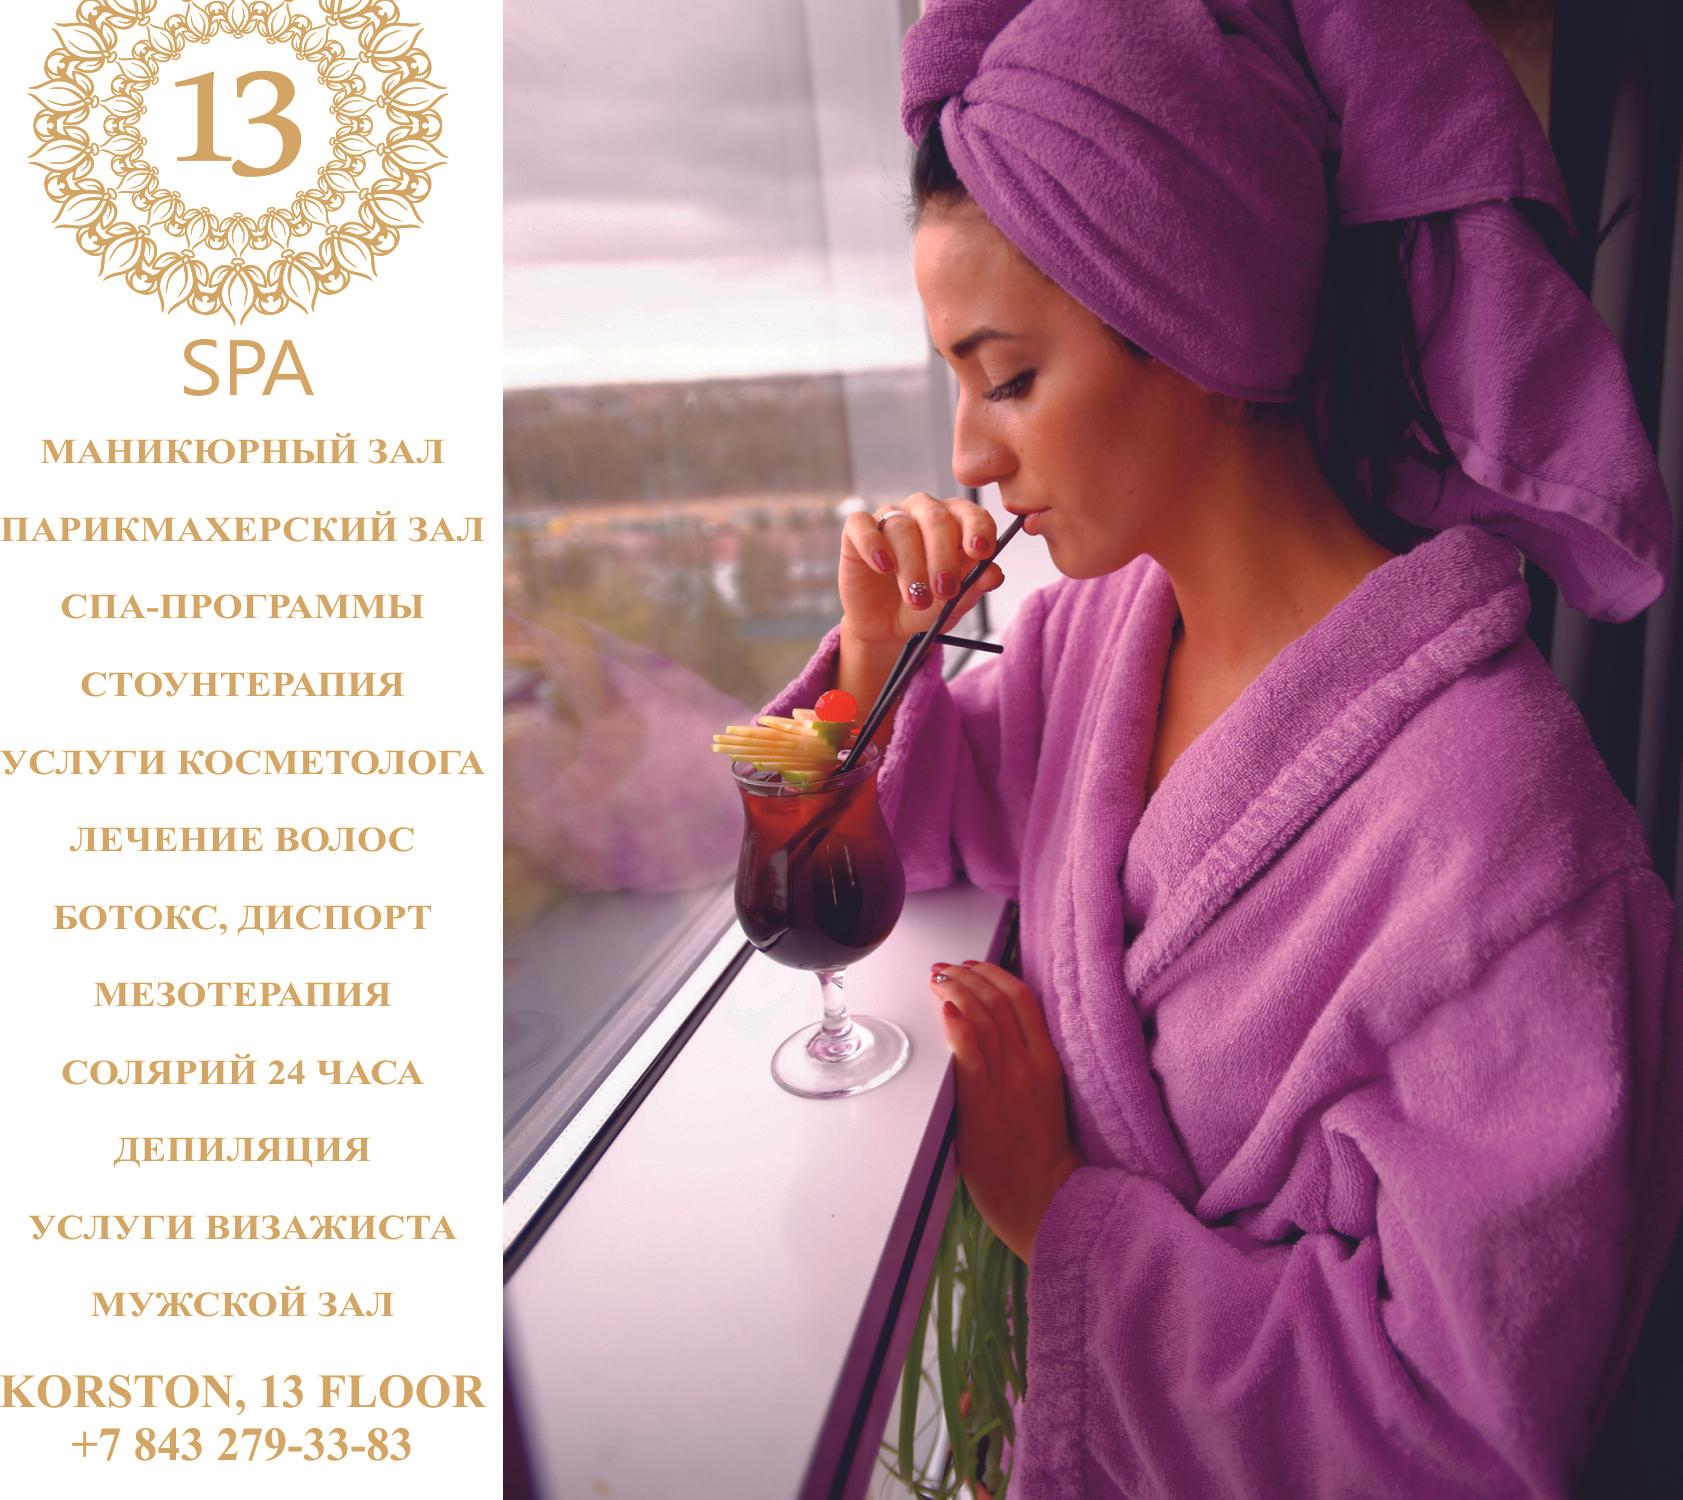 фотография Image-Studio & SPA 13 при отеле Корстон